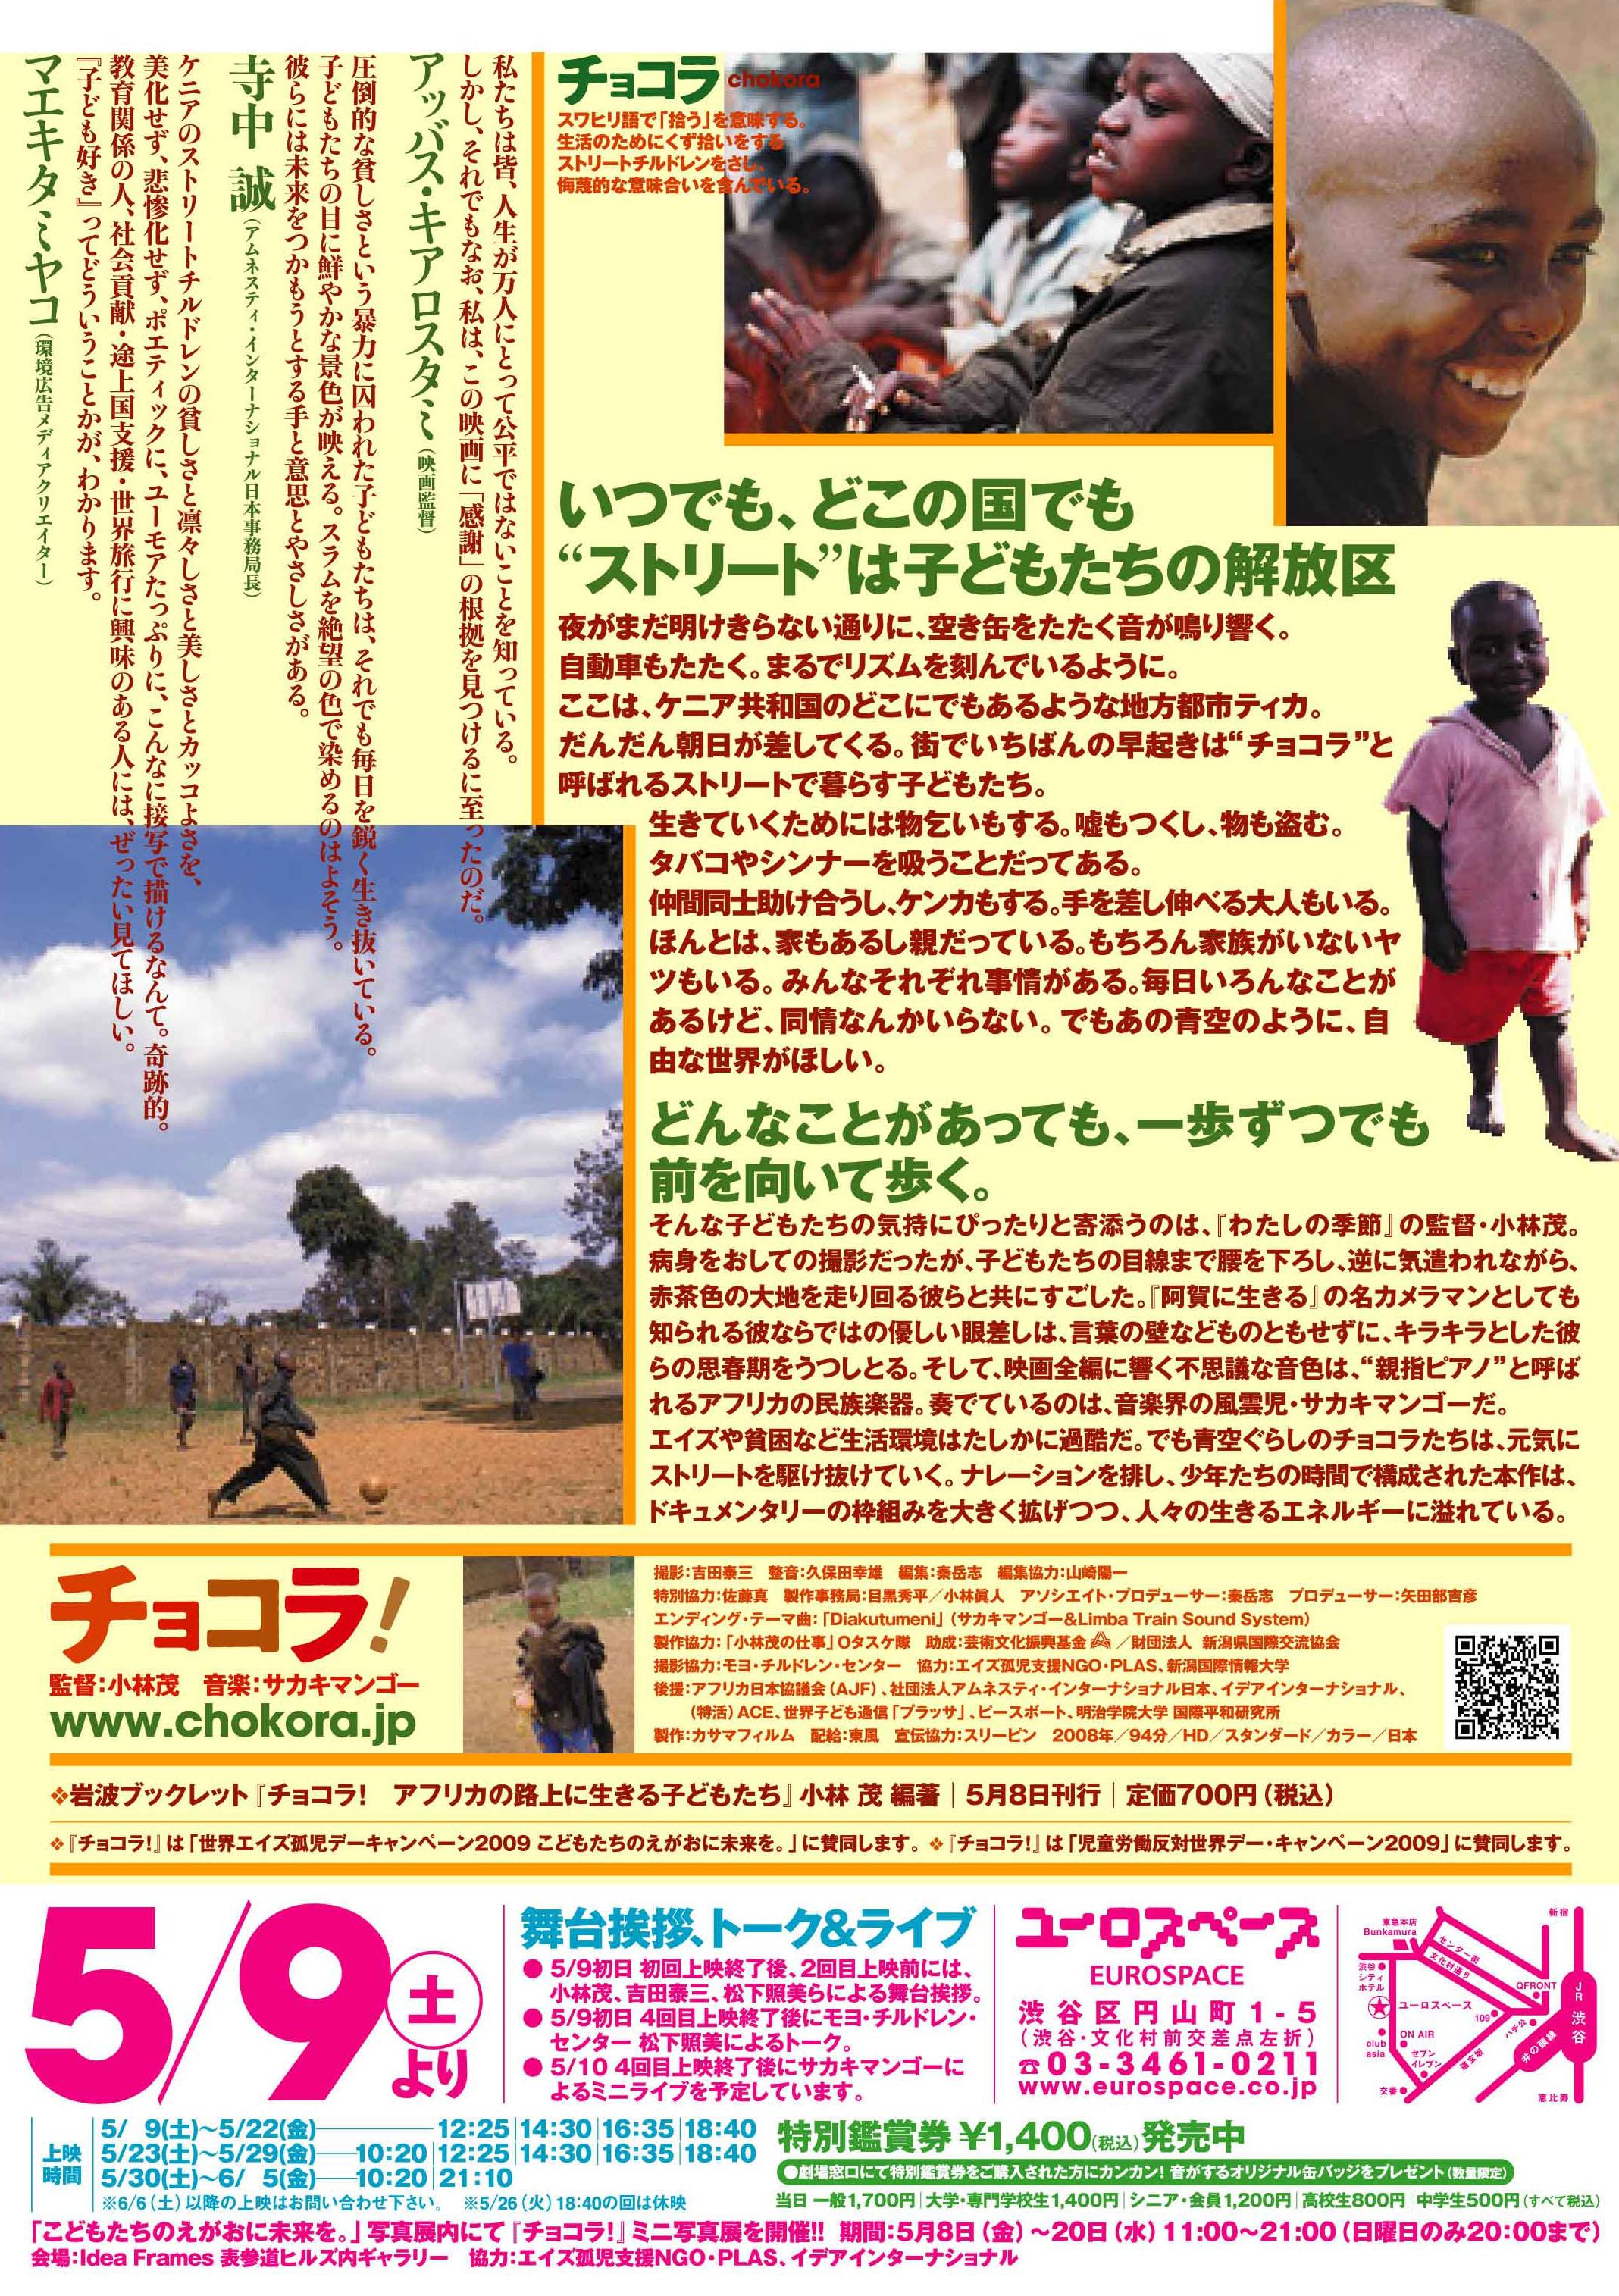 http://www.chokora.jp/images/chokoraflyer-new-ura-L.jpg